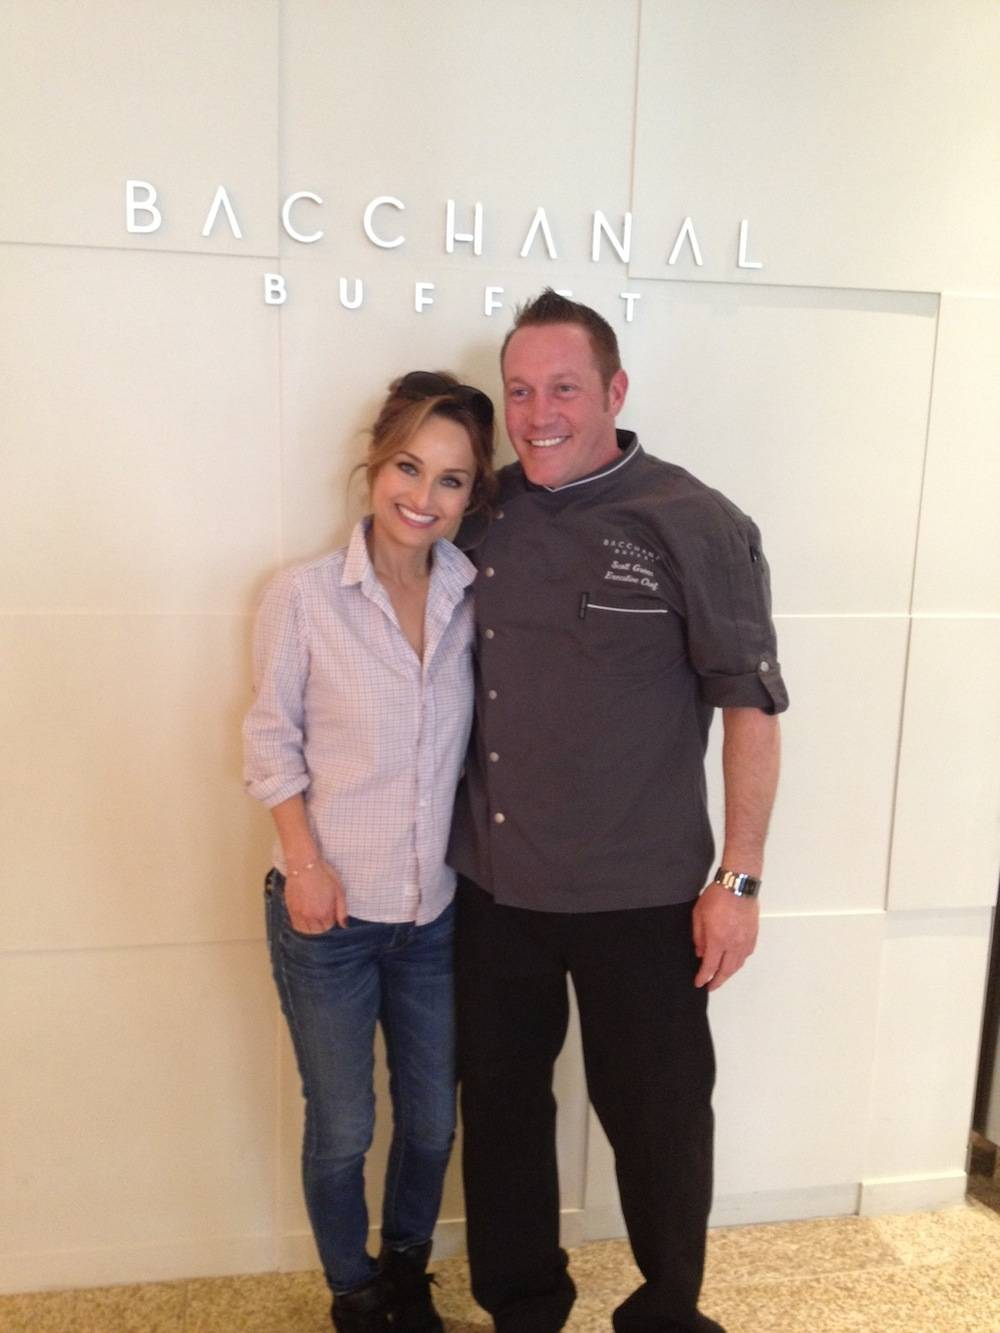 Giada De Laurentiis and Bacchanal Buffet's executive chef Scott Green at the Bacchanal Buffet.